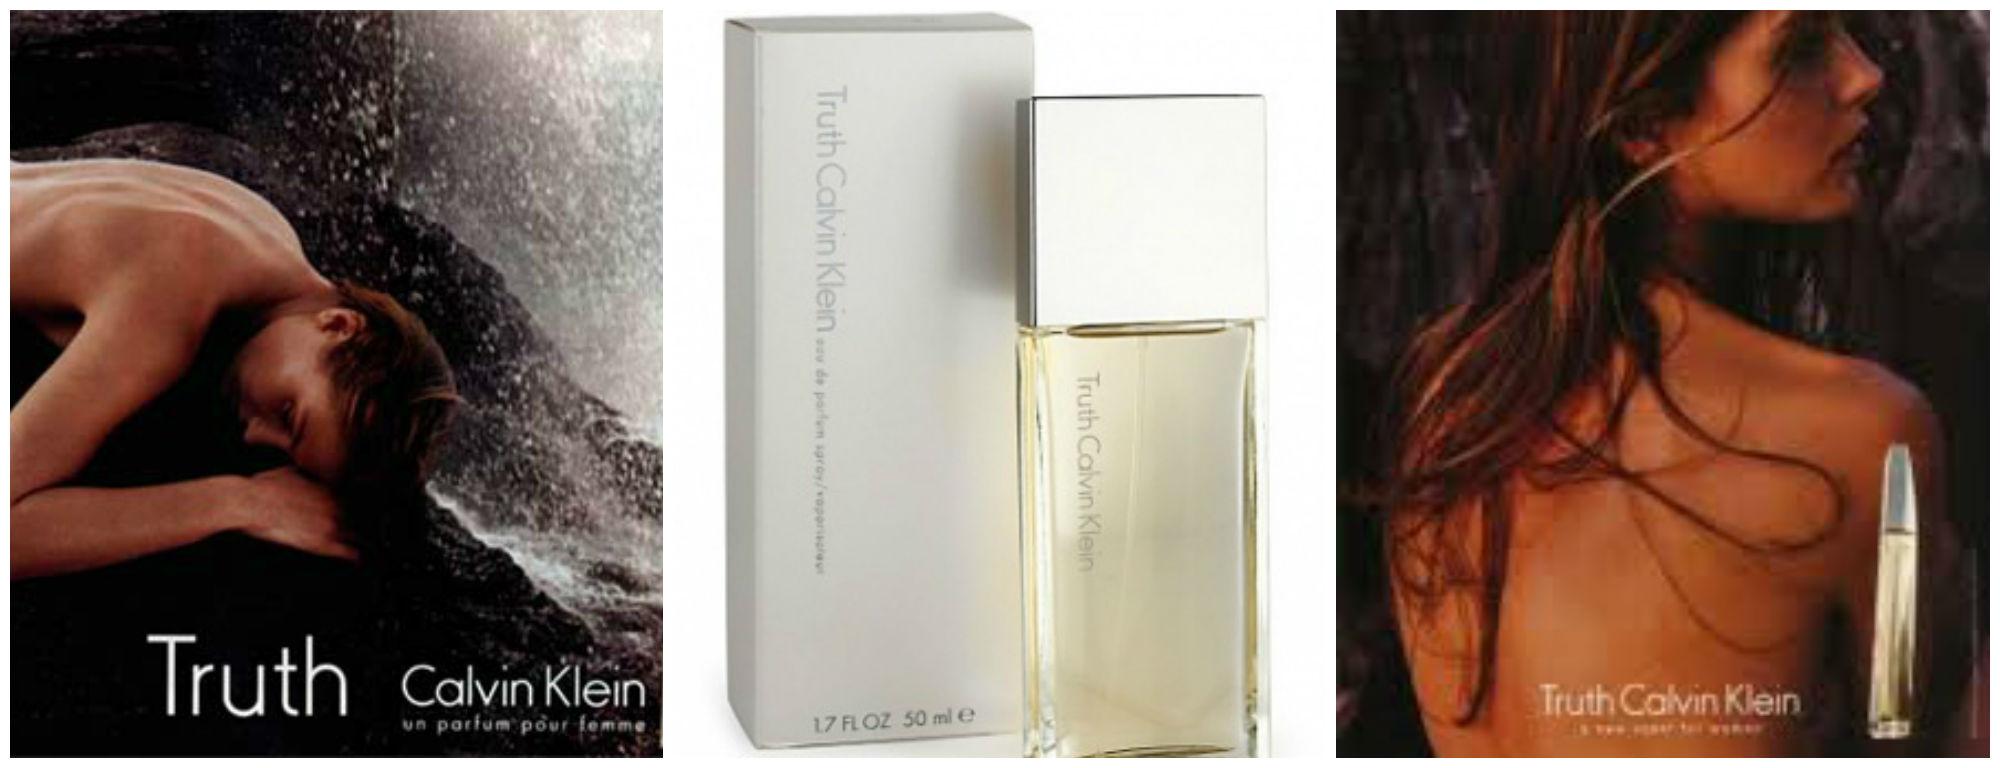 Review Truth Calvin Calvin Truth Klein Truth Review Klein Calvin Klein Perfume Perfume HED92YeWI